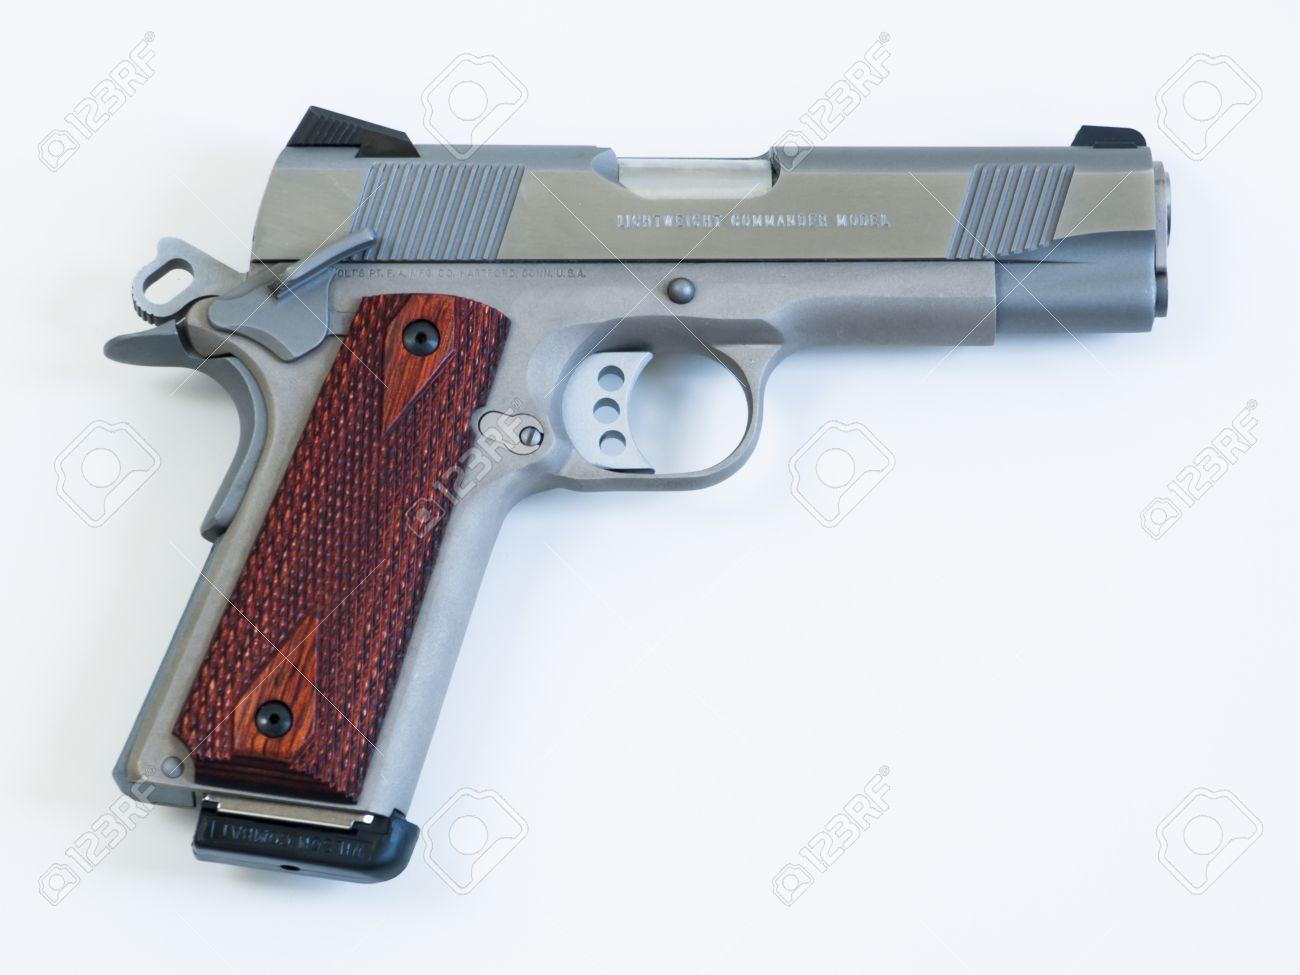 U.S. Army WWI Colt M1911 Pistol